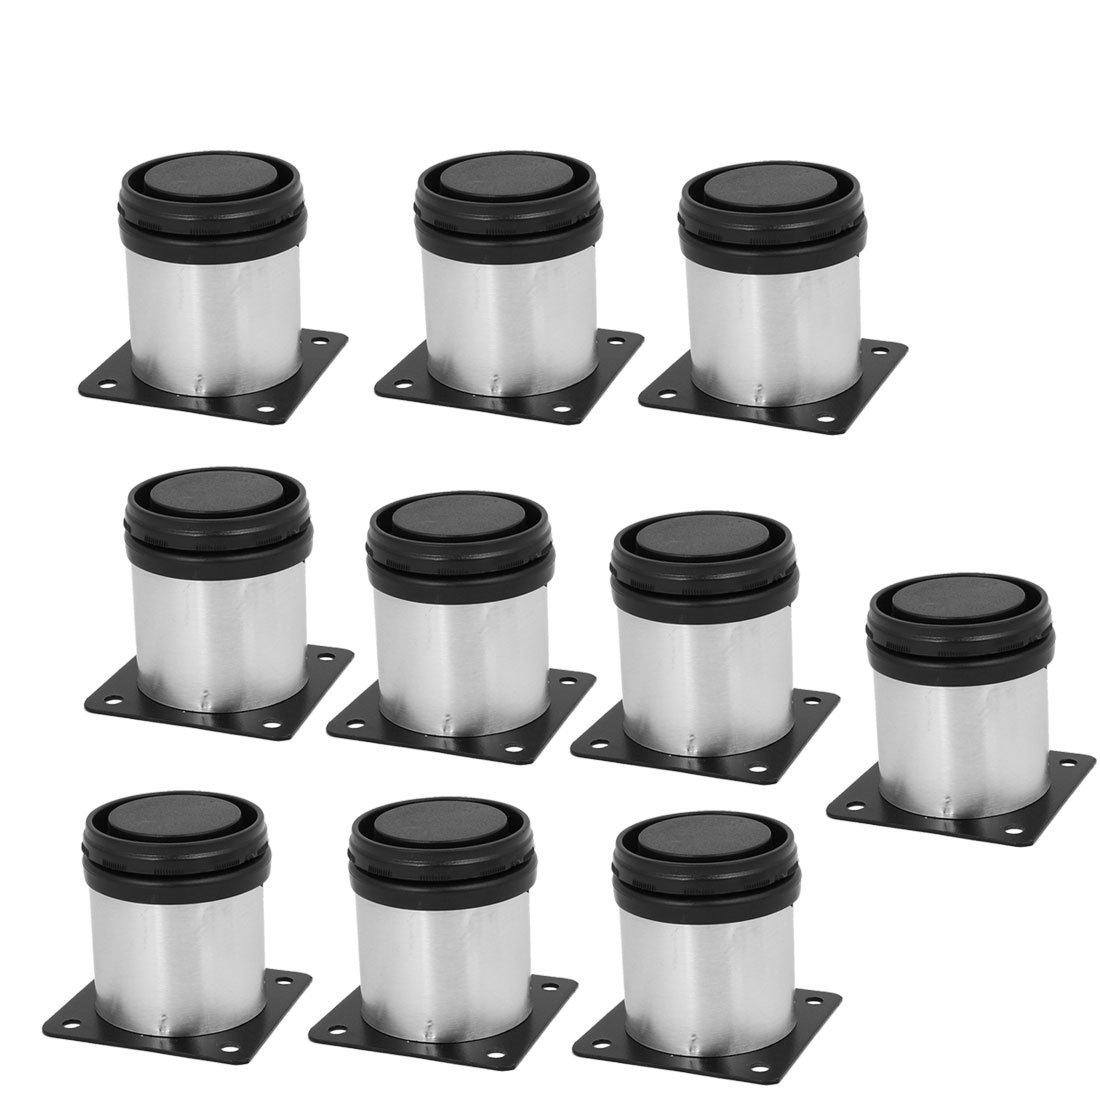 uxcell Kitchen Furniture Cabinet 50mm x 60mm Adjustable Feet Leg Round Stand 10PCS